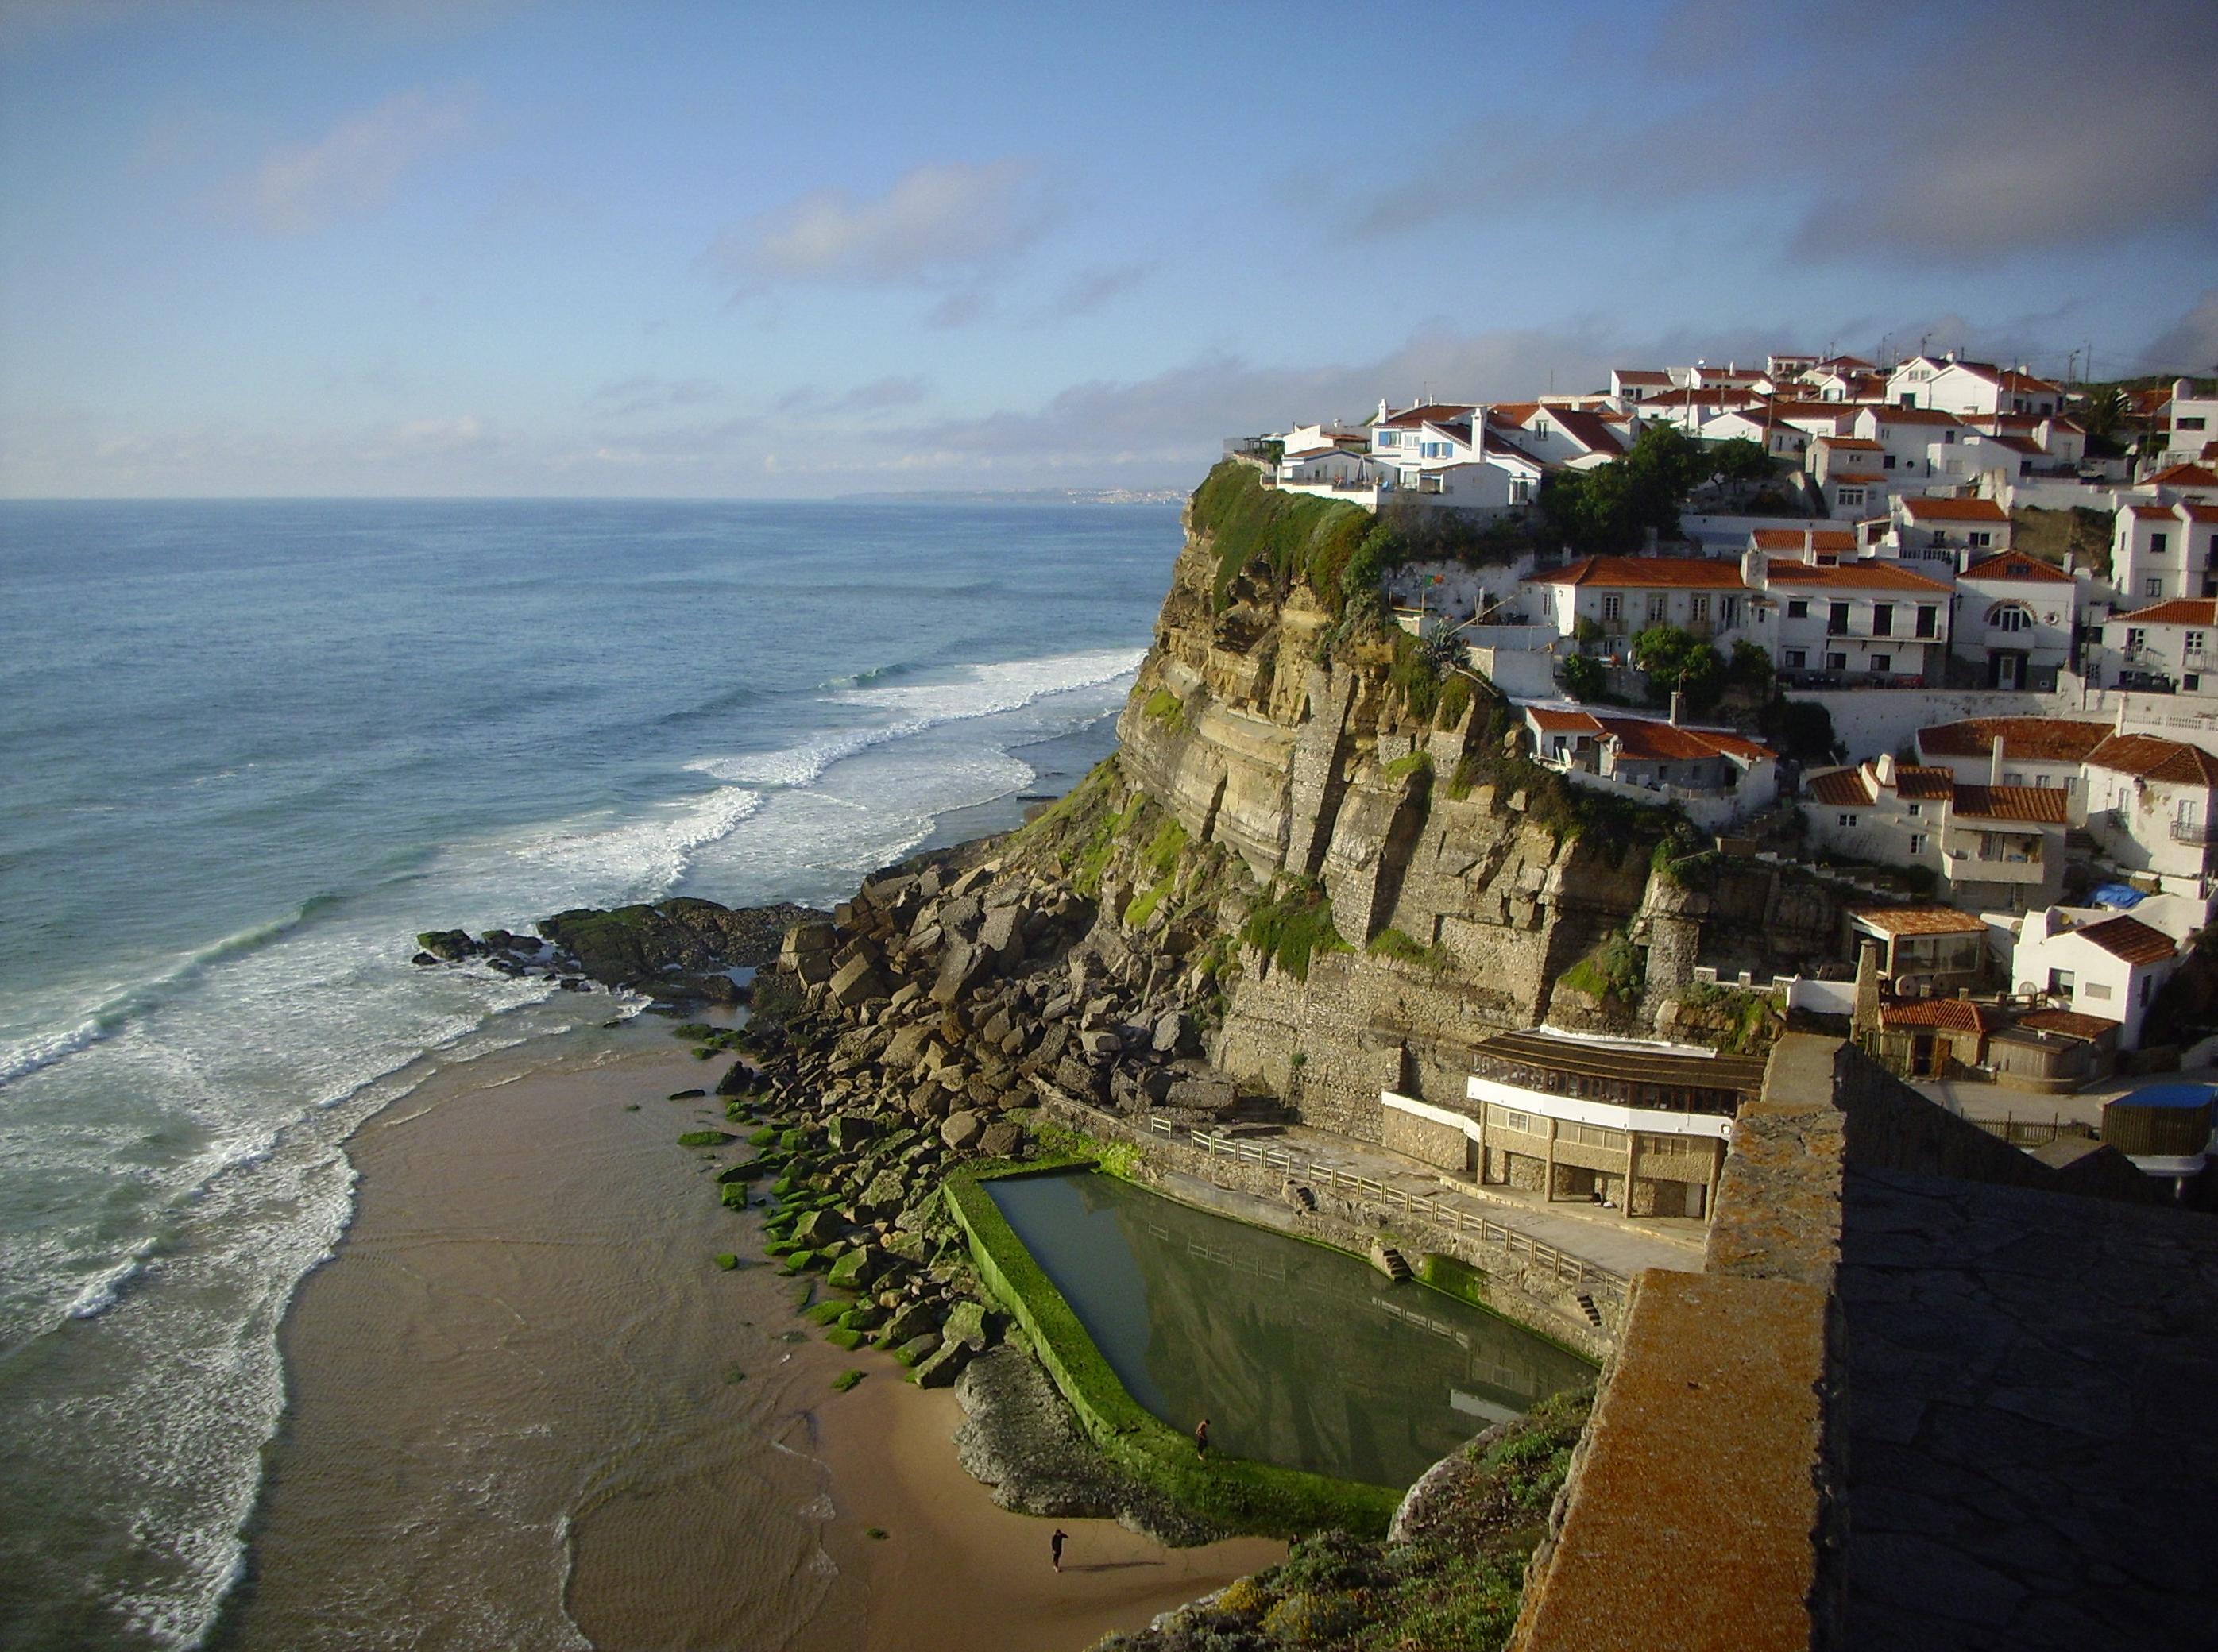 Azenhas do Mar village